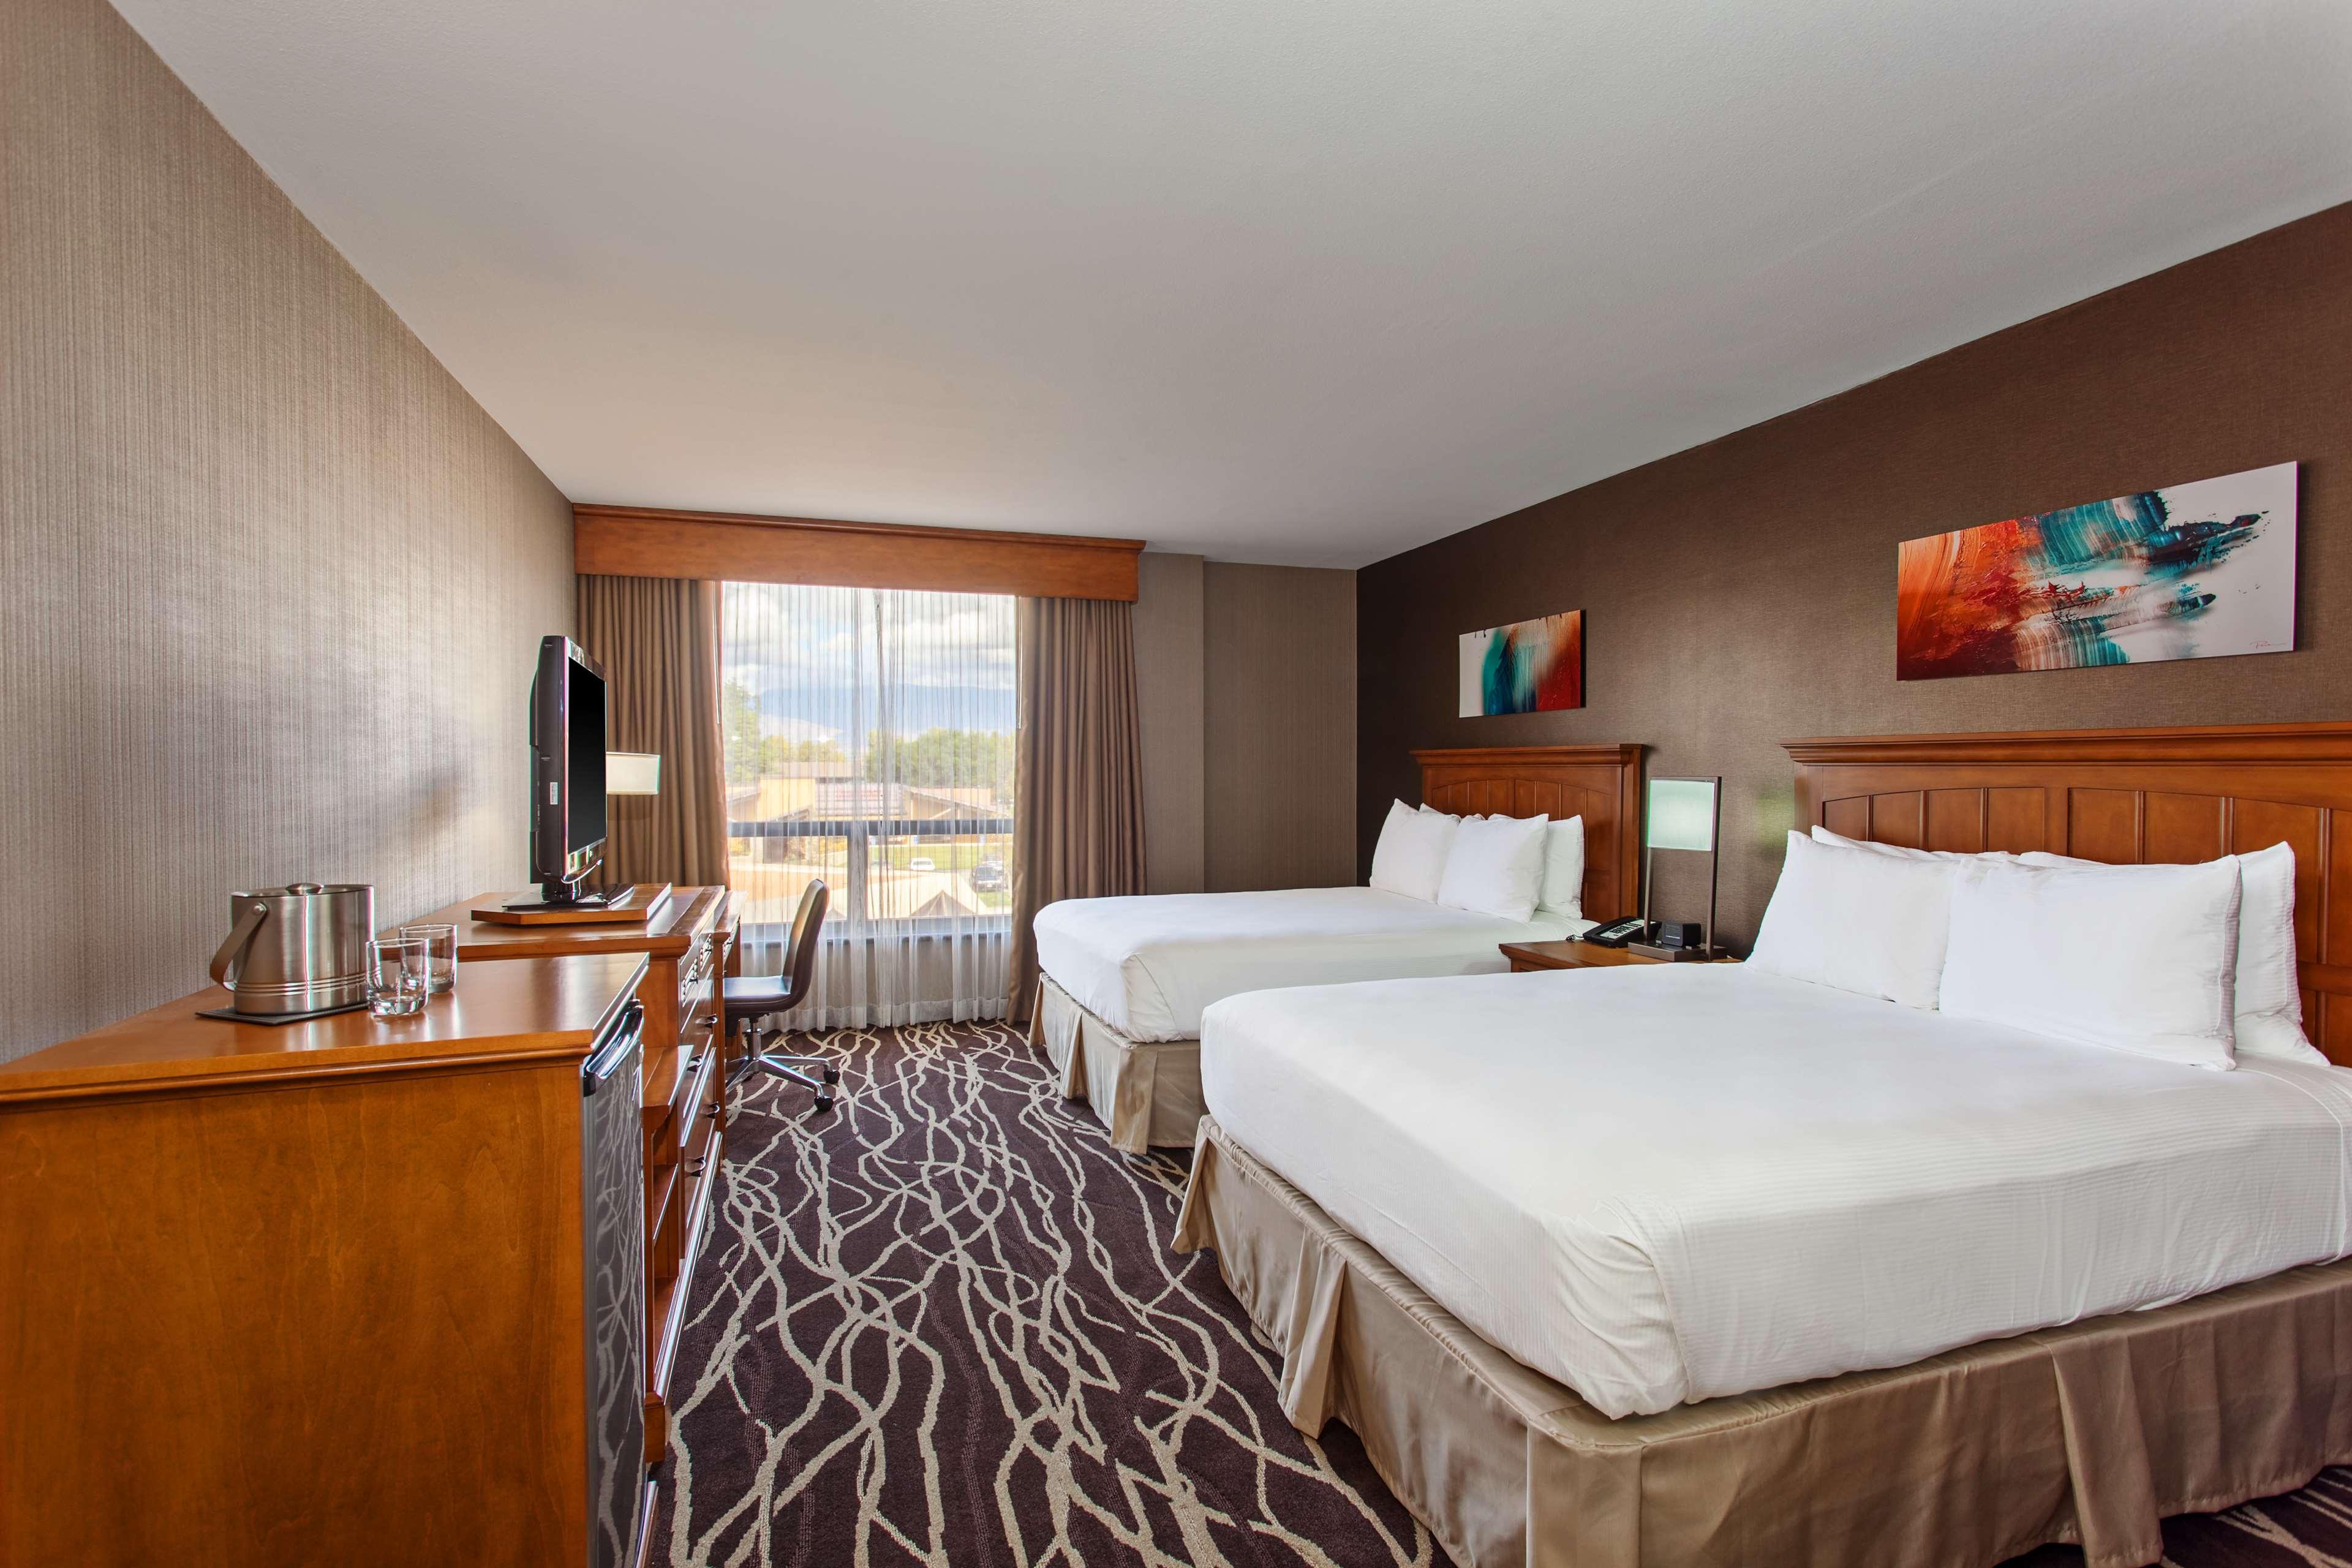 DoubleTree by Hilton Hotel San Bernardino image 25